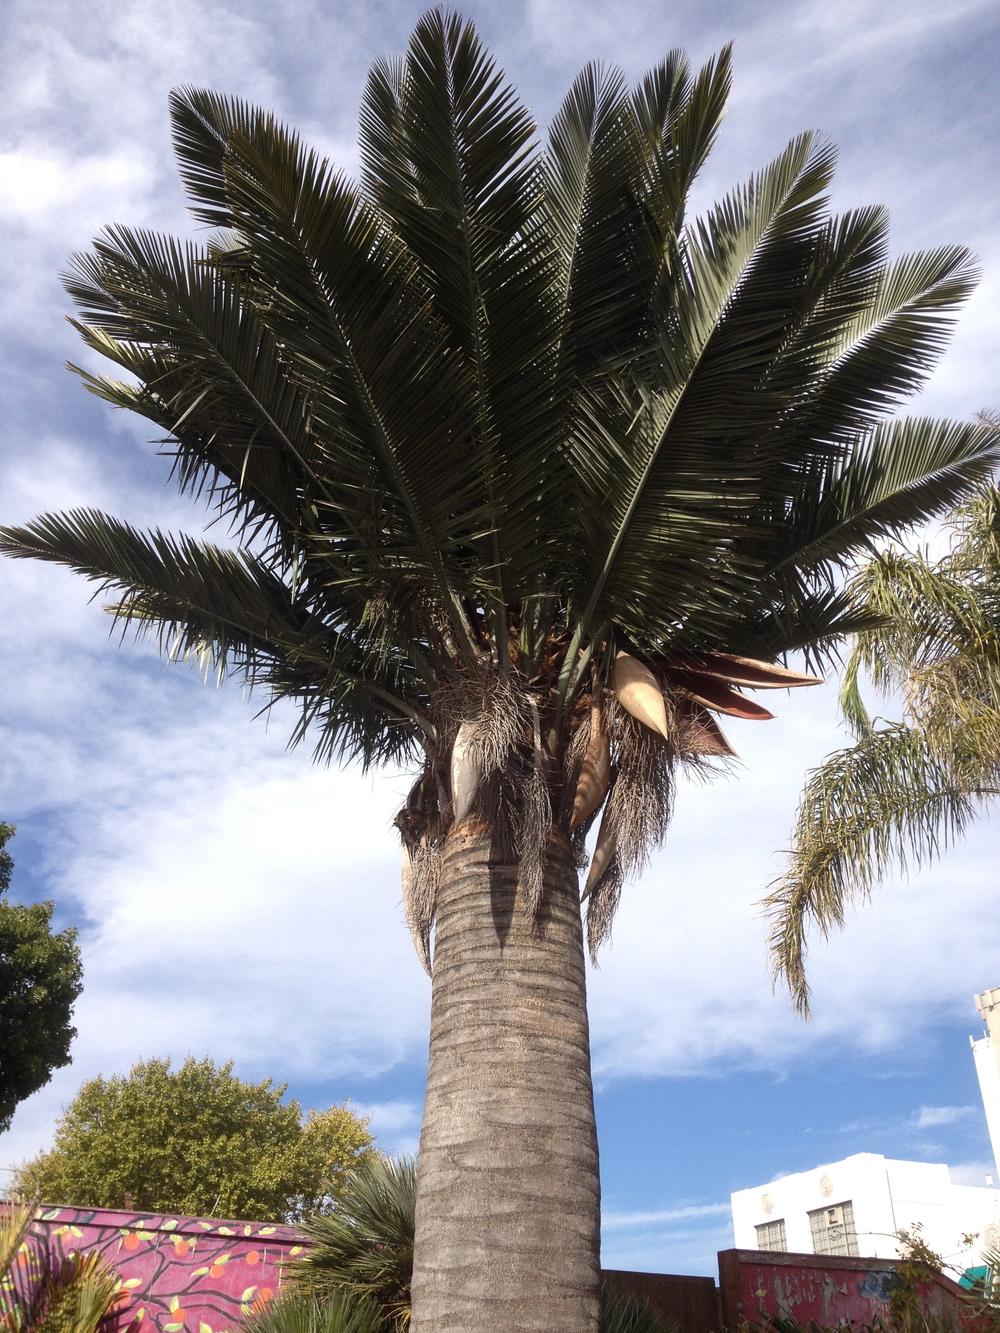 Chilean wine palm (Jubaea chilensis) on Florida Street